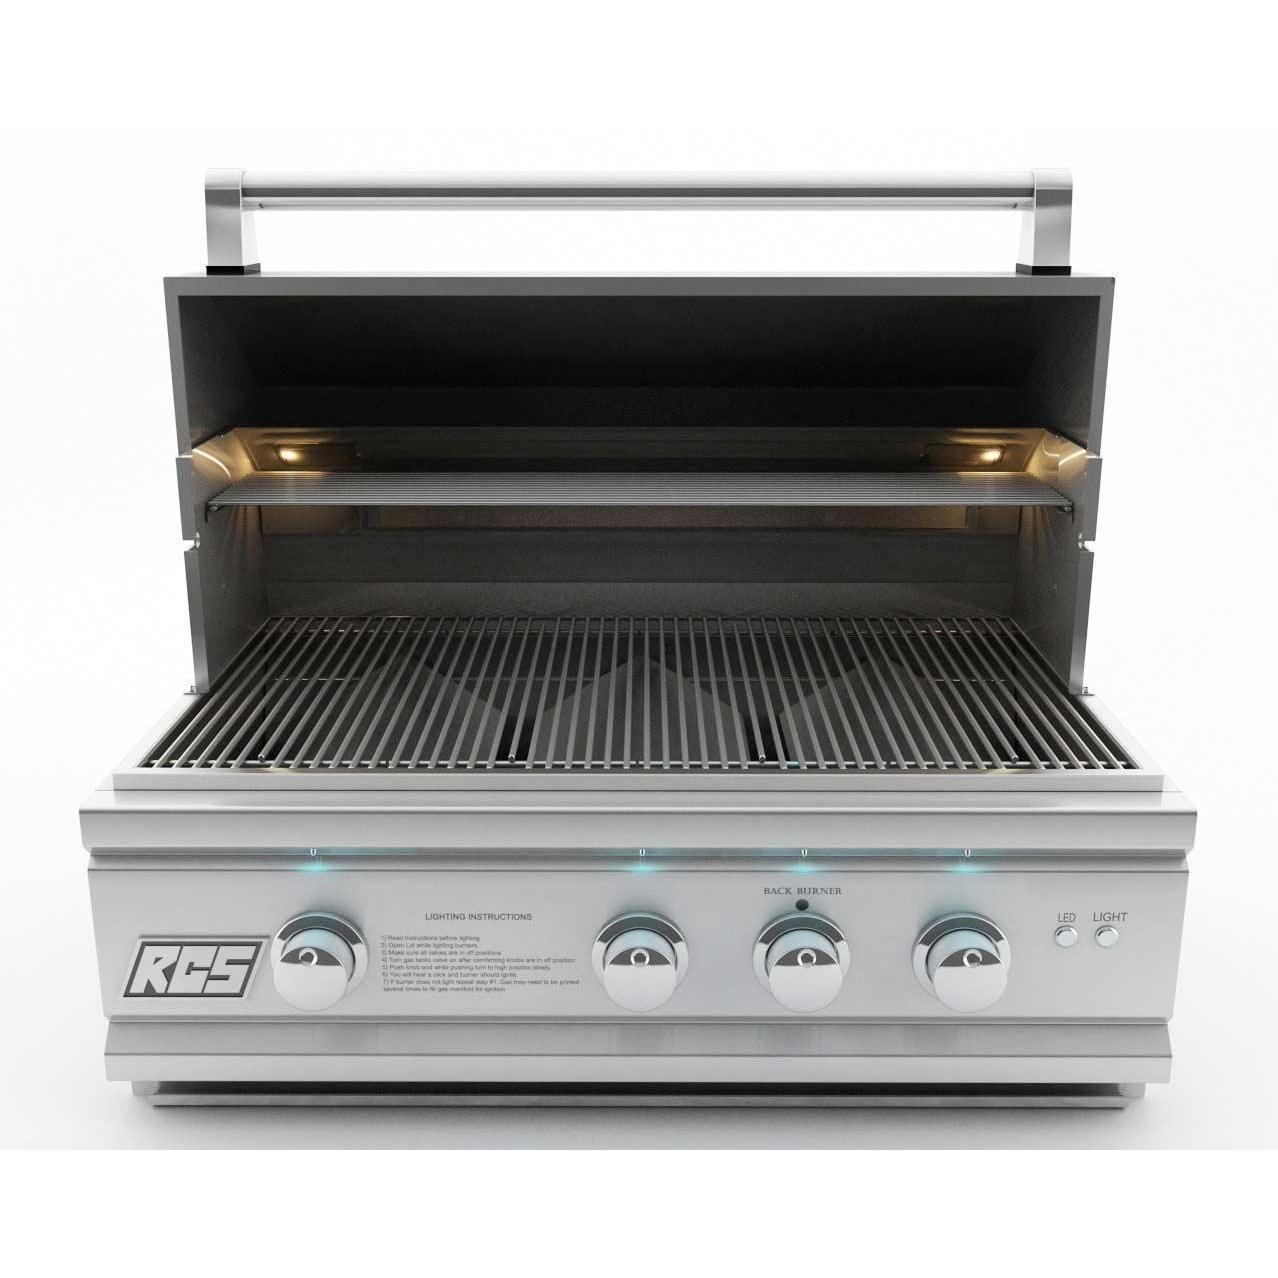 RCS Cutlass Pro 30-Inch Built-In Propane Gas Grill 2603110